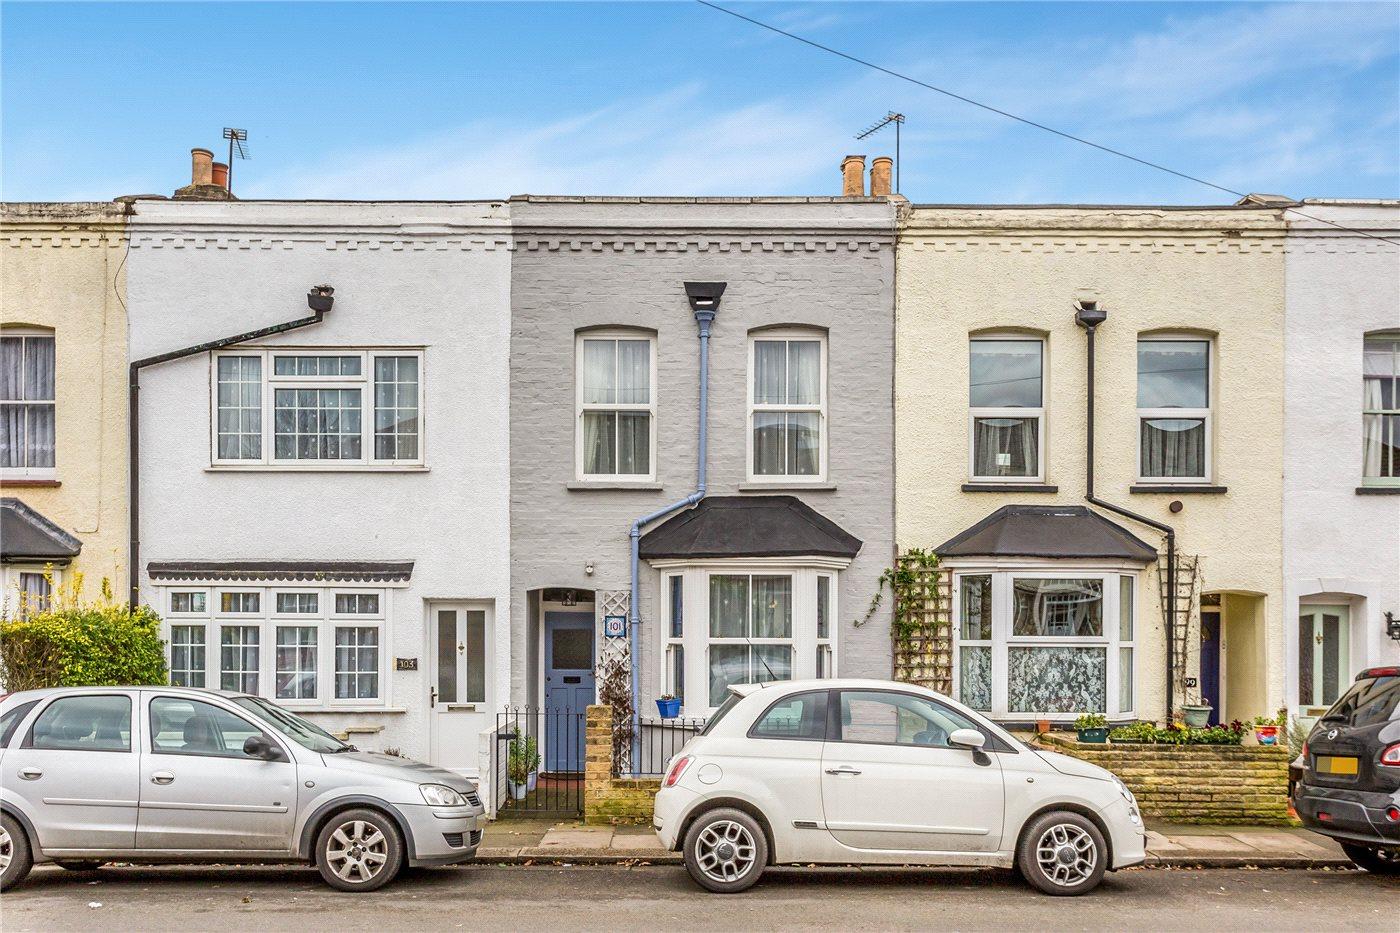 2 Bedroom Property For Sale In Goat Lane Enfield En1